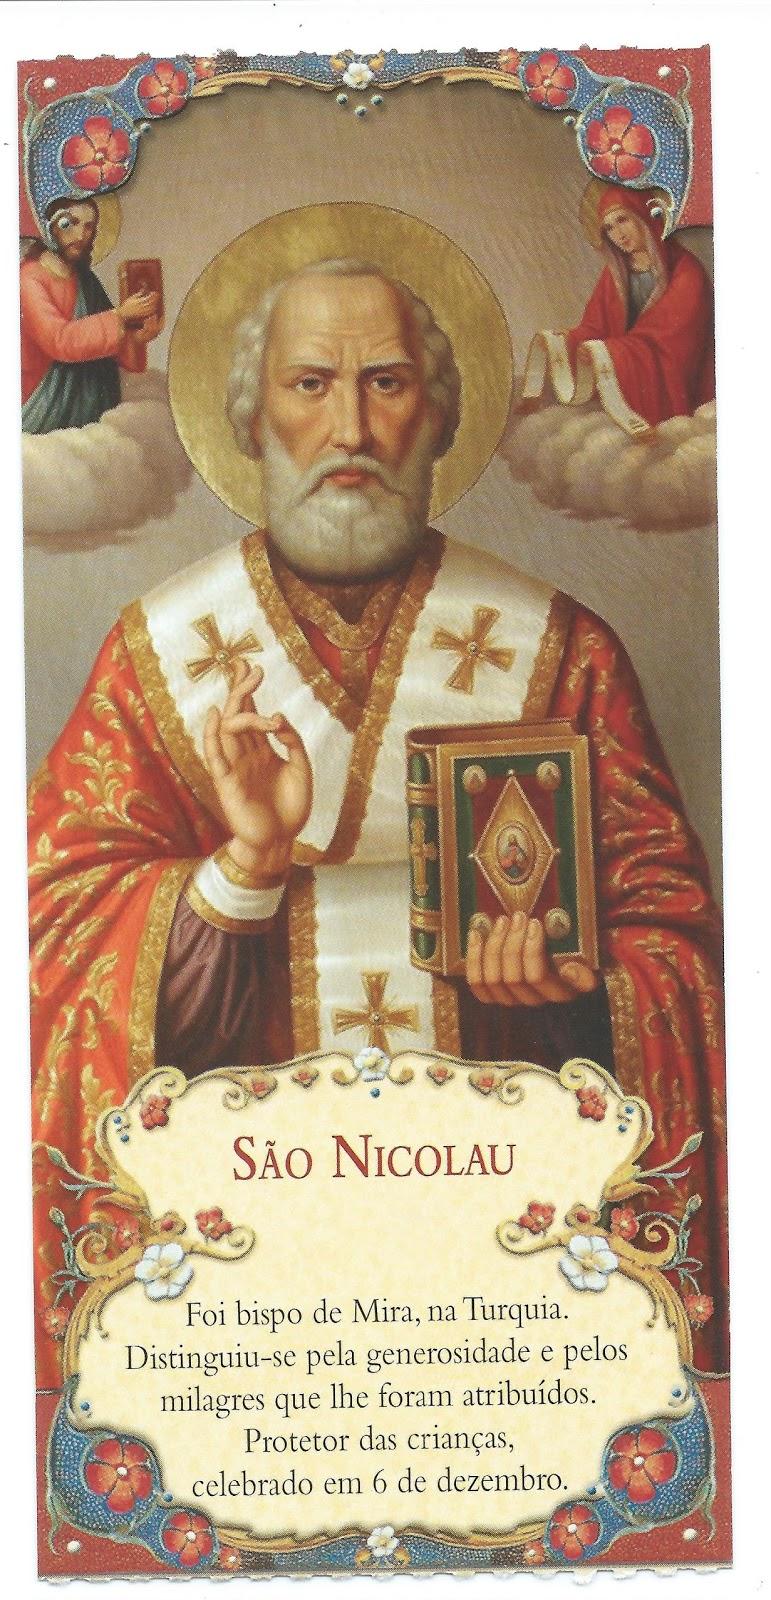 17884f1c53d1 169) SÃO NICOLAU